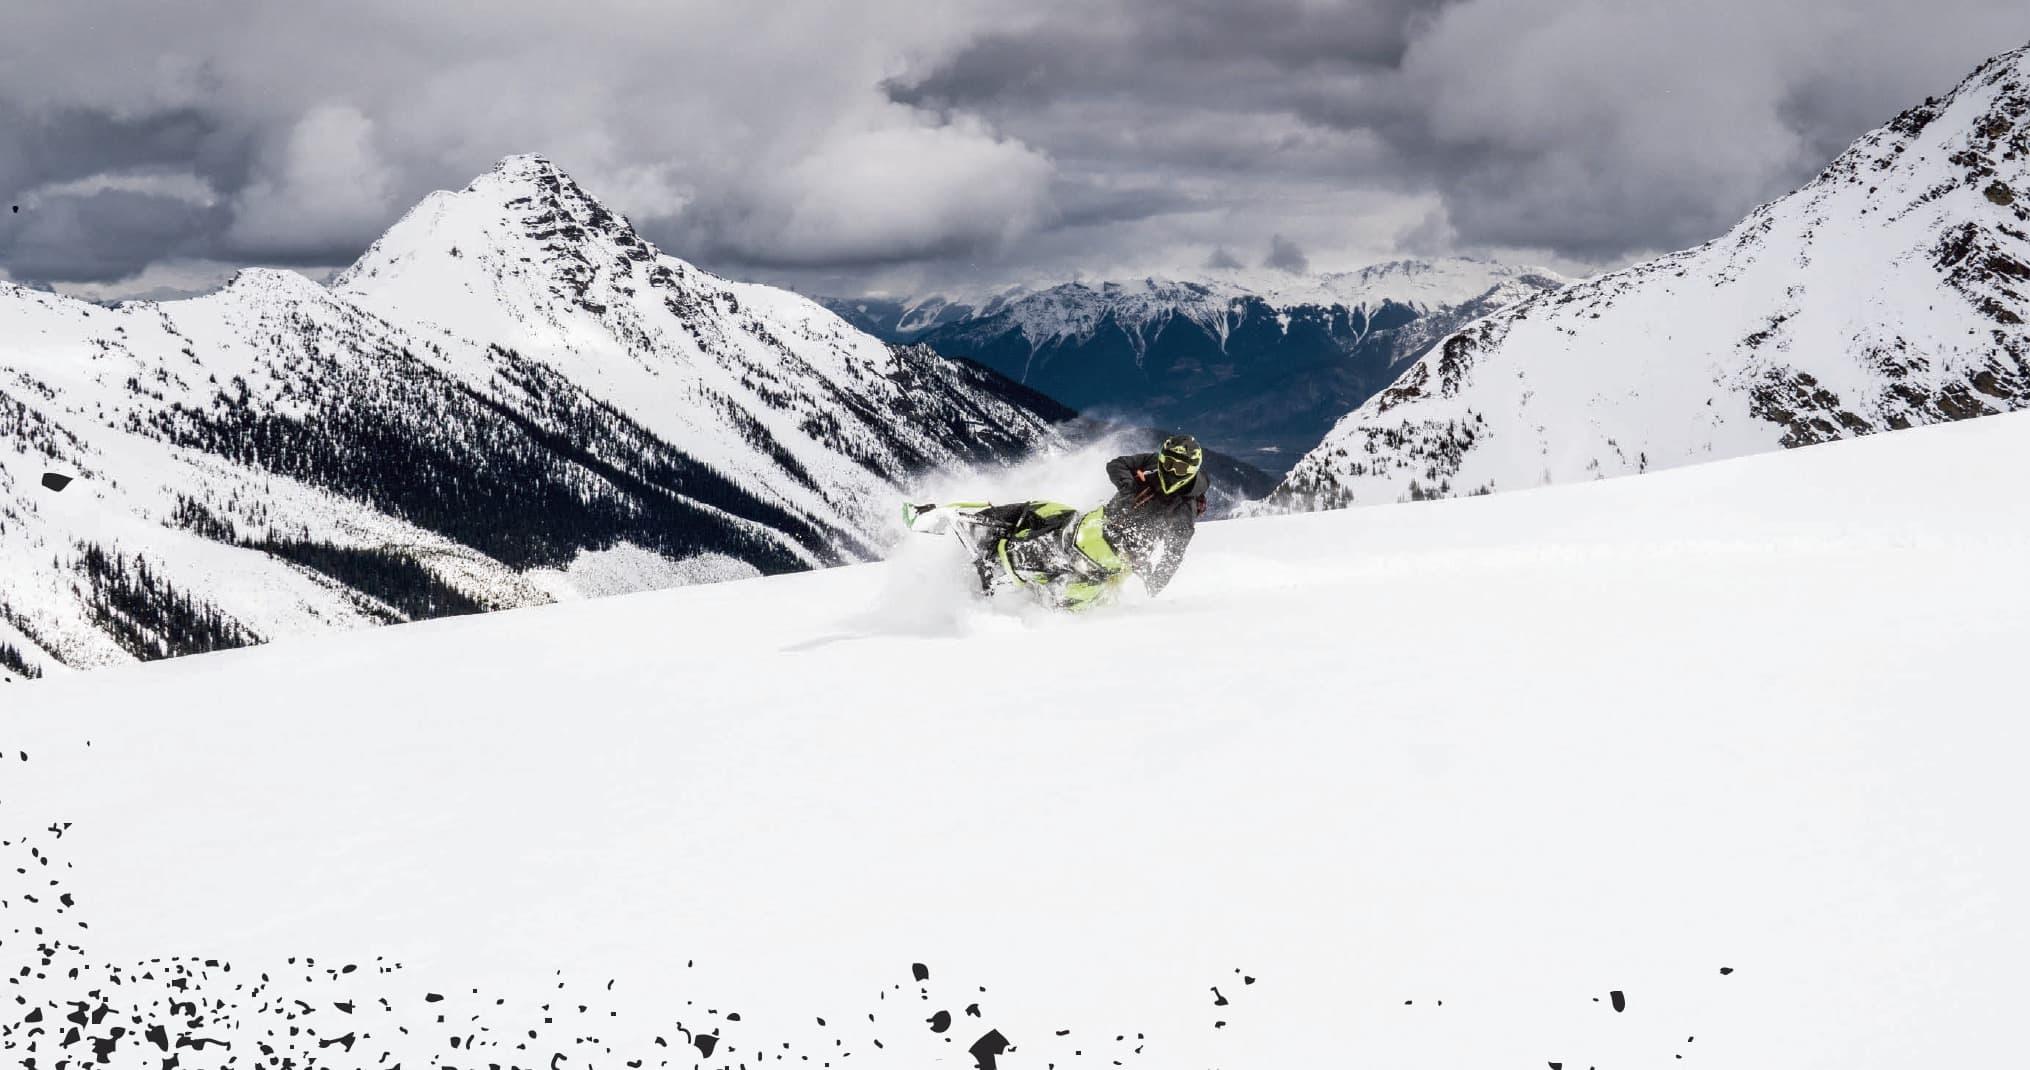 Mountain Sledder Spring Shoot 2018 Gear